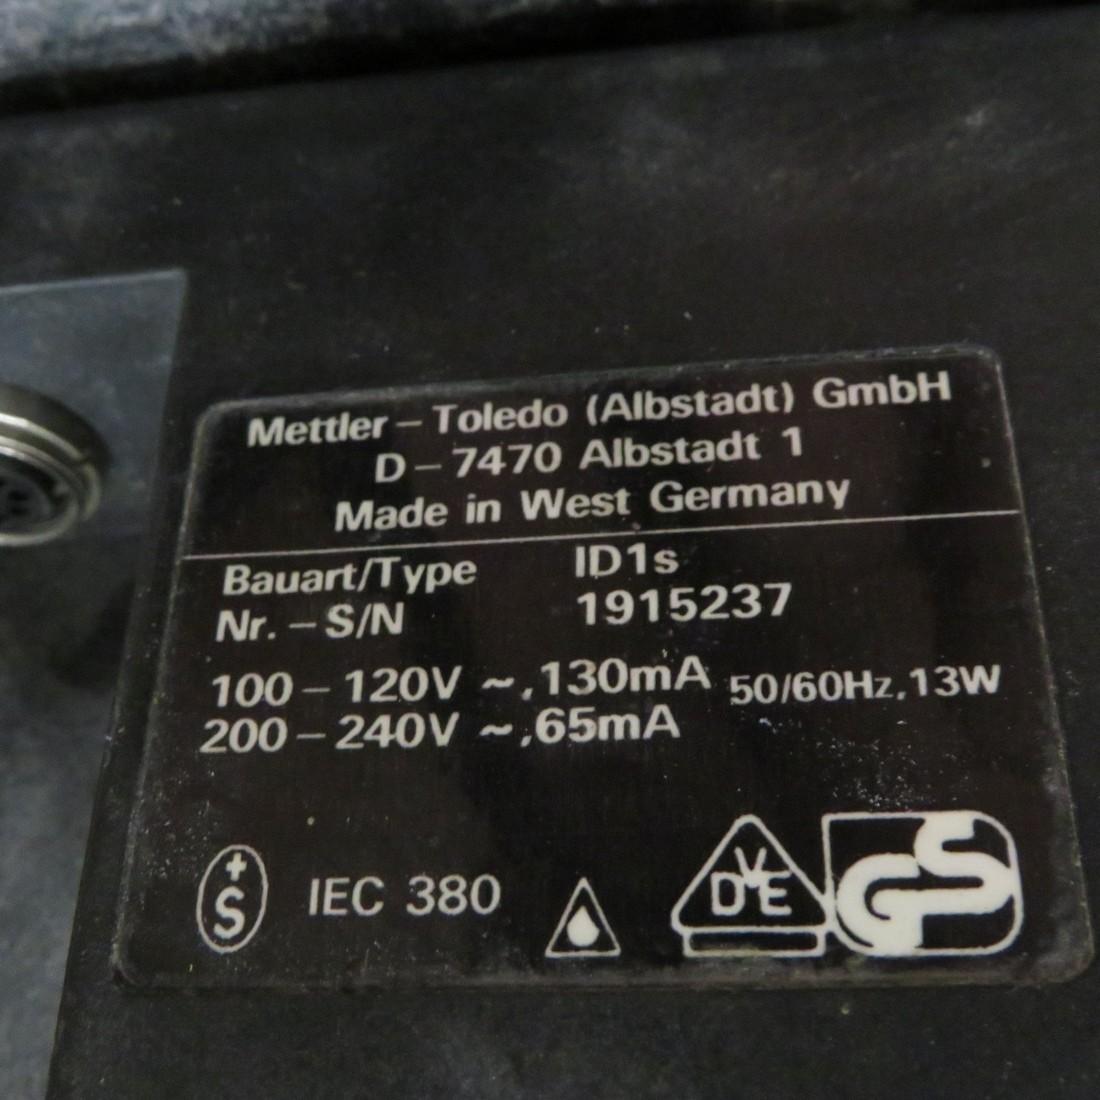 R14T919 METTLER -TOLEDO  weighing pallet scale ID1s type - 550 kilos